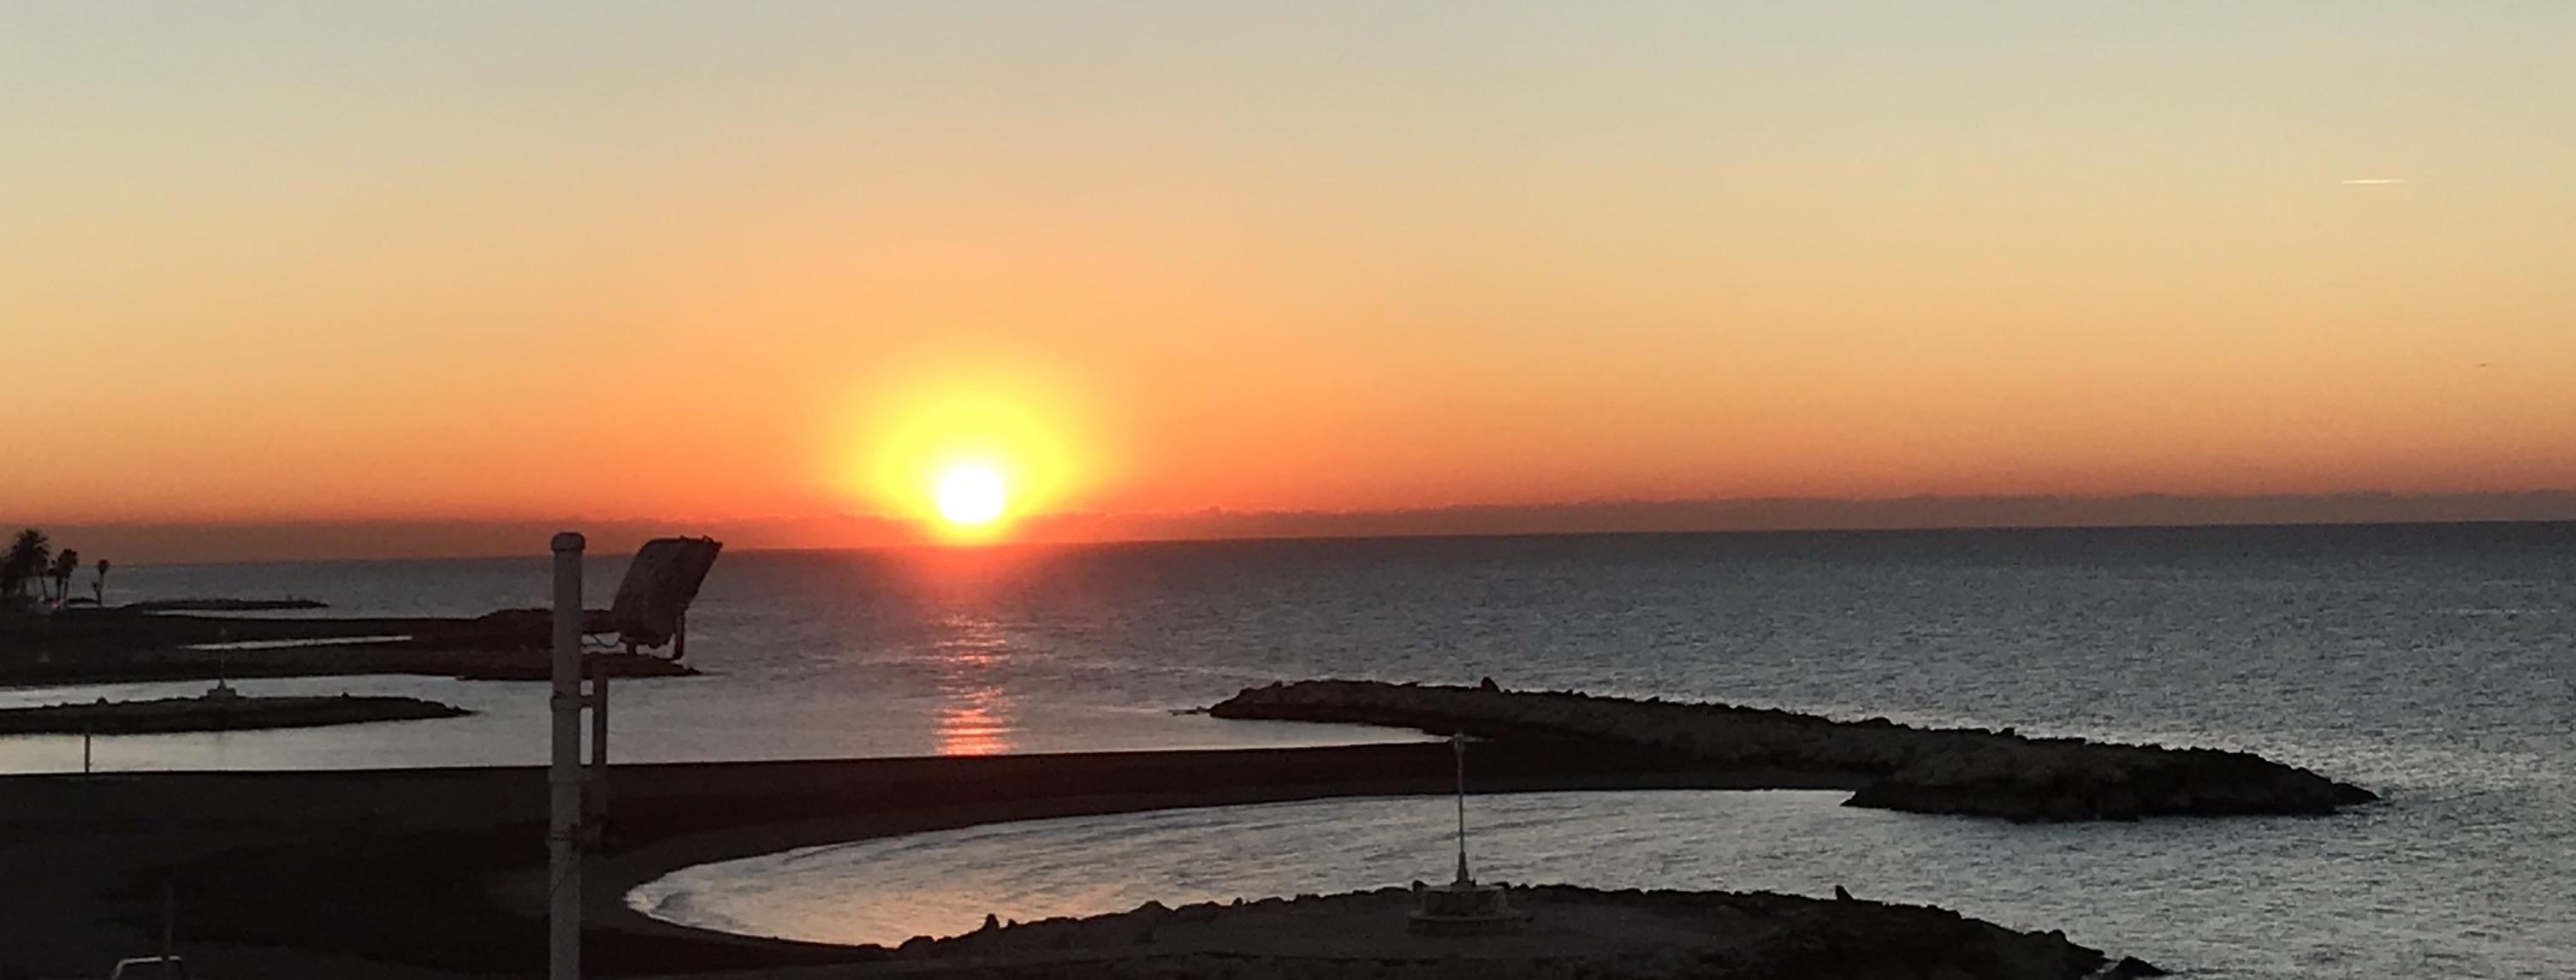 sunrise Malaga (mijn innerlijke reis) - Power to Blossom